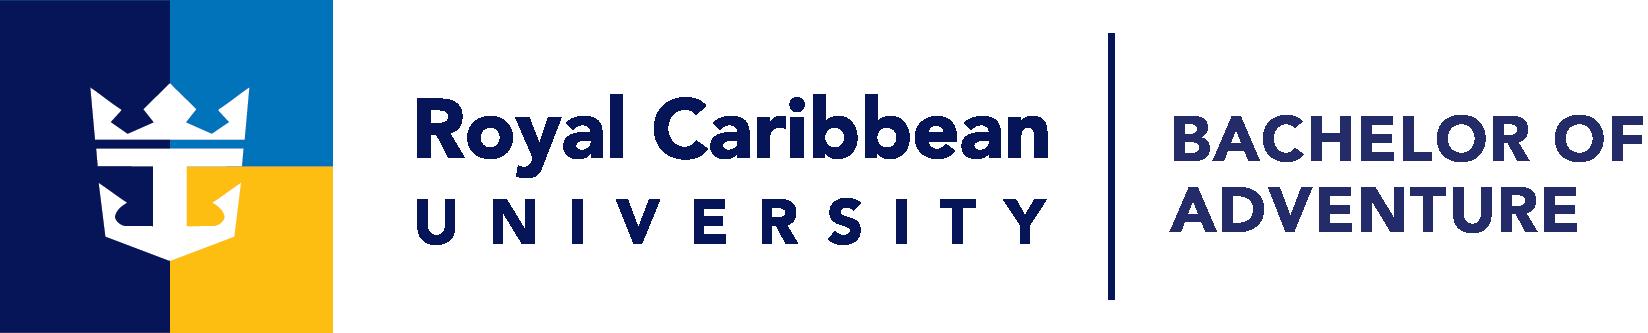 Royal Caribbean University